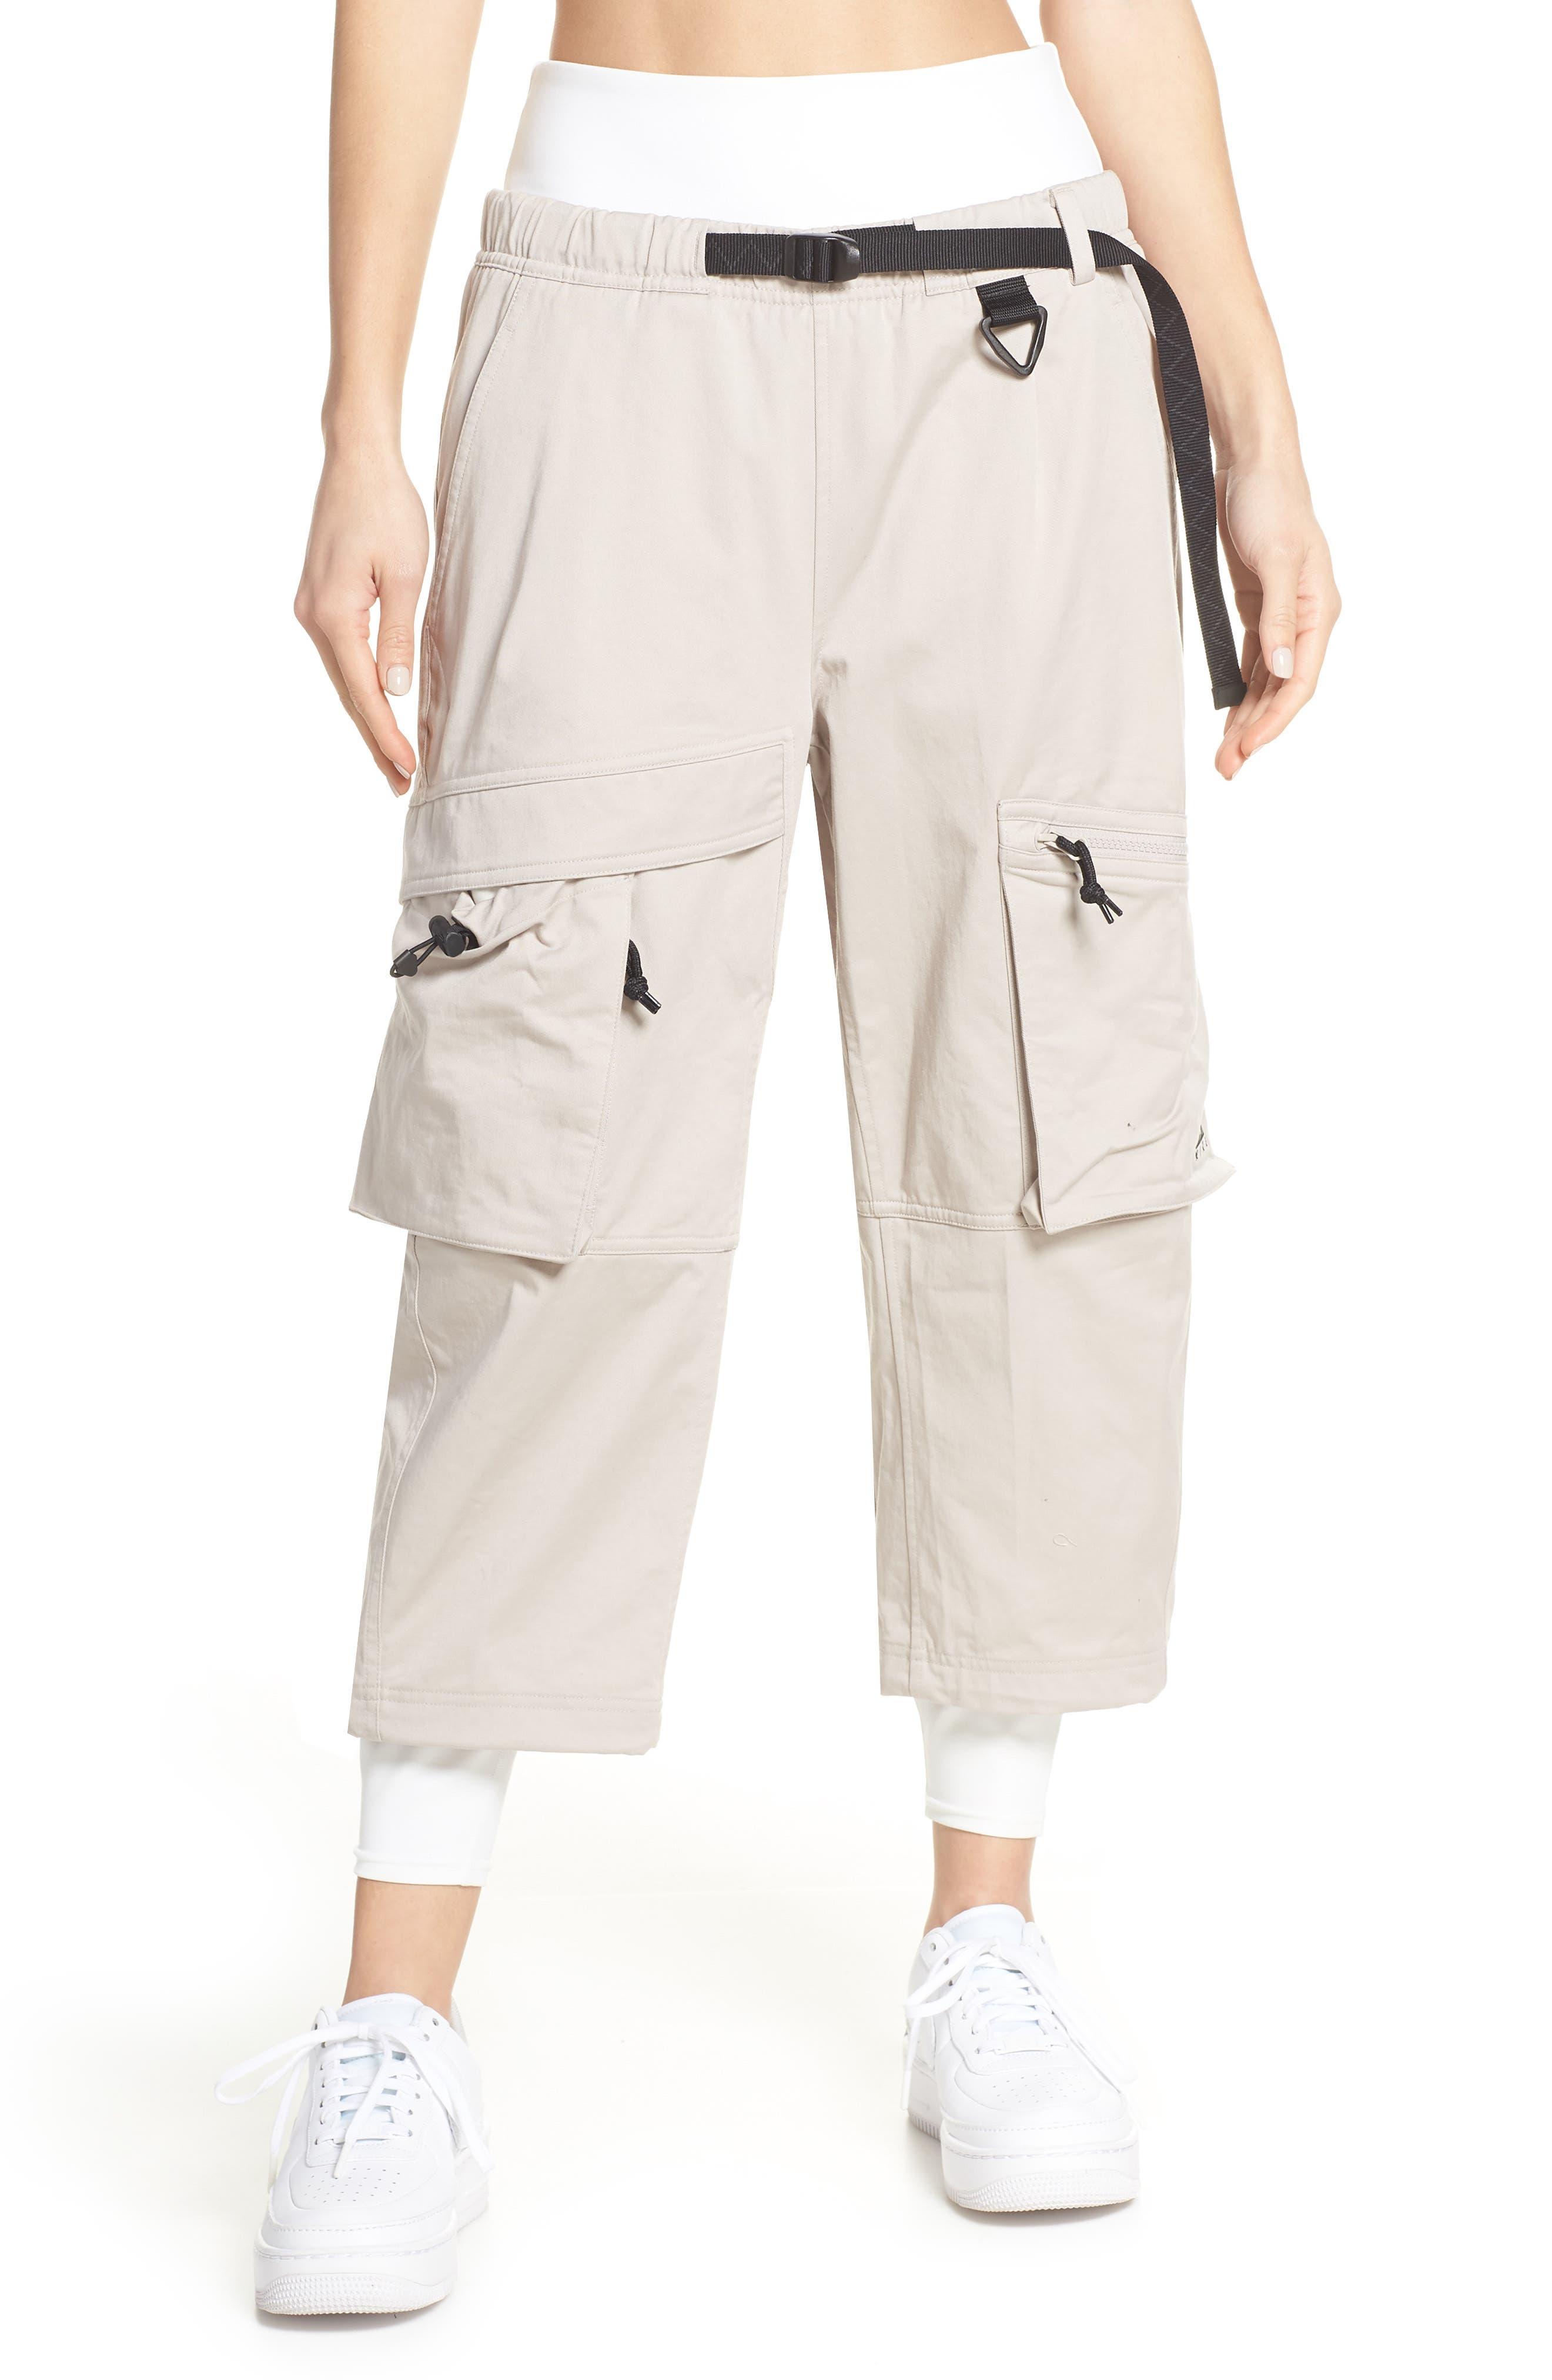 NIKE ACG Women's Cargo Pants, Main, color, MOON PARTICLE